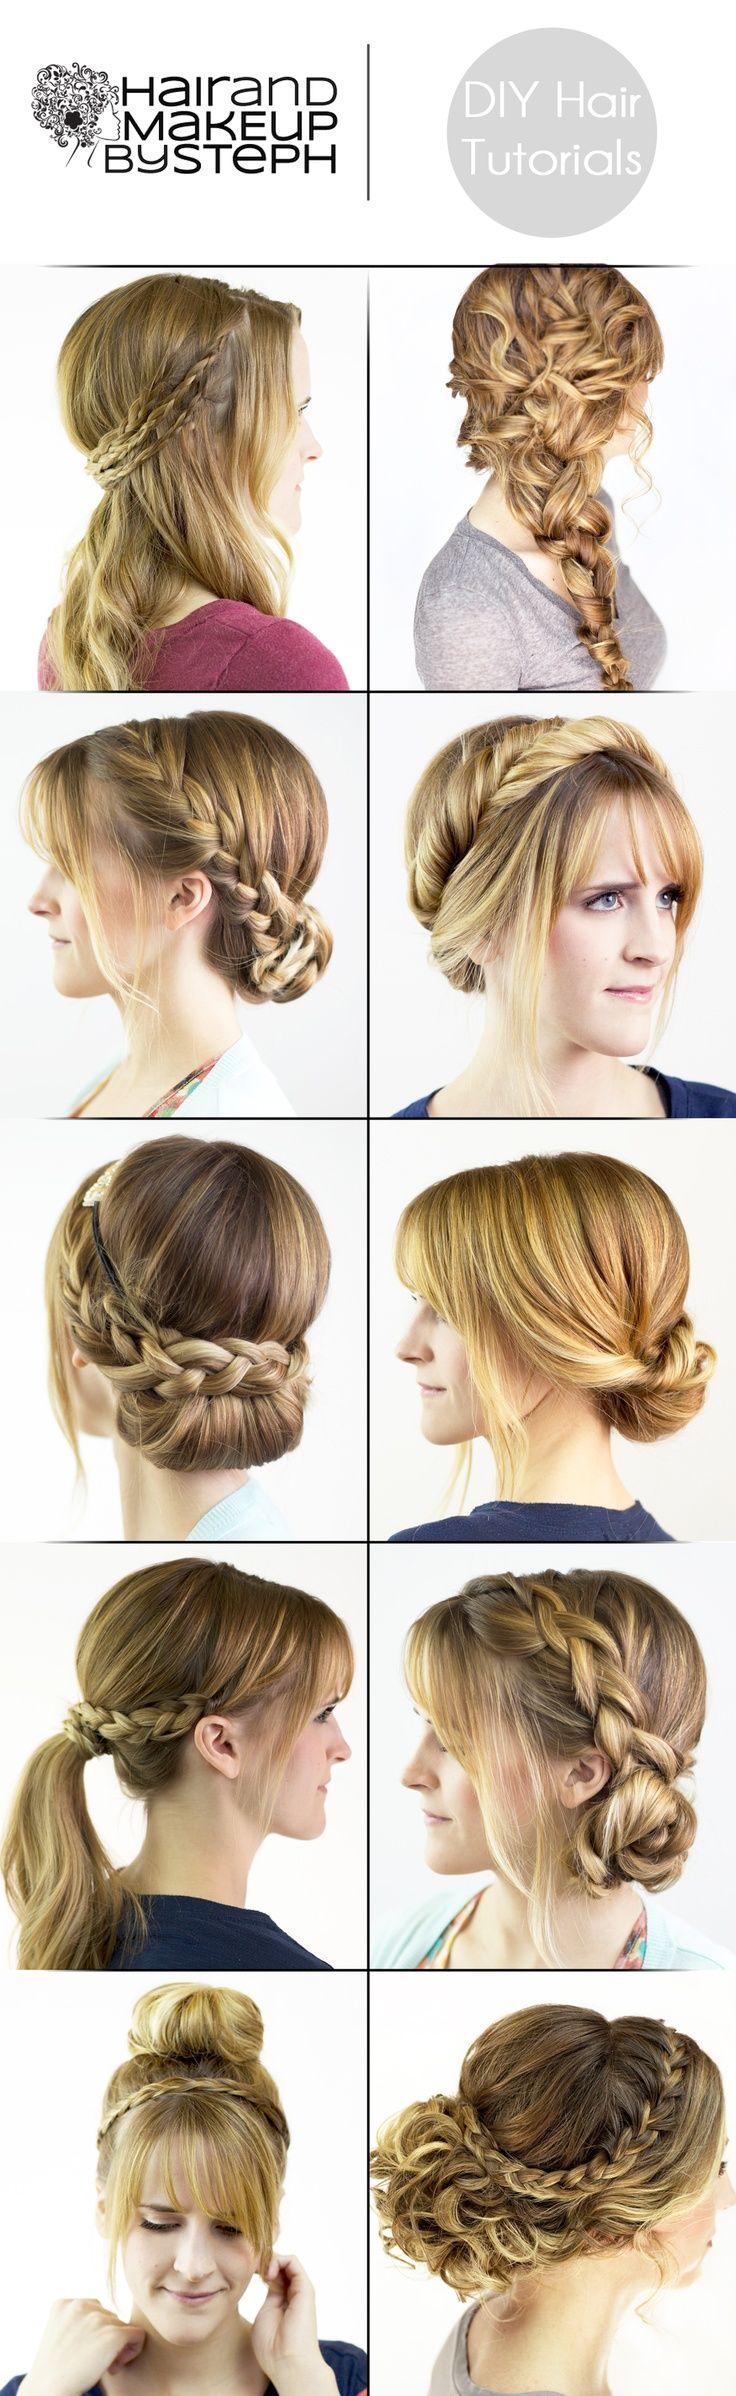 23 DIY hair styles..